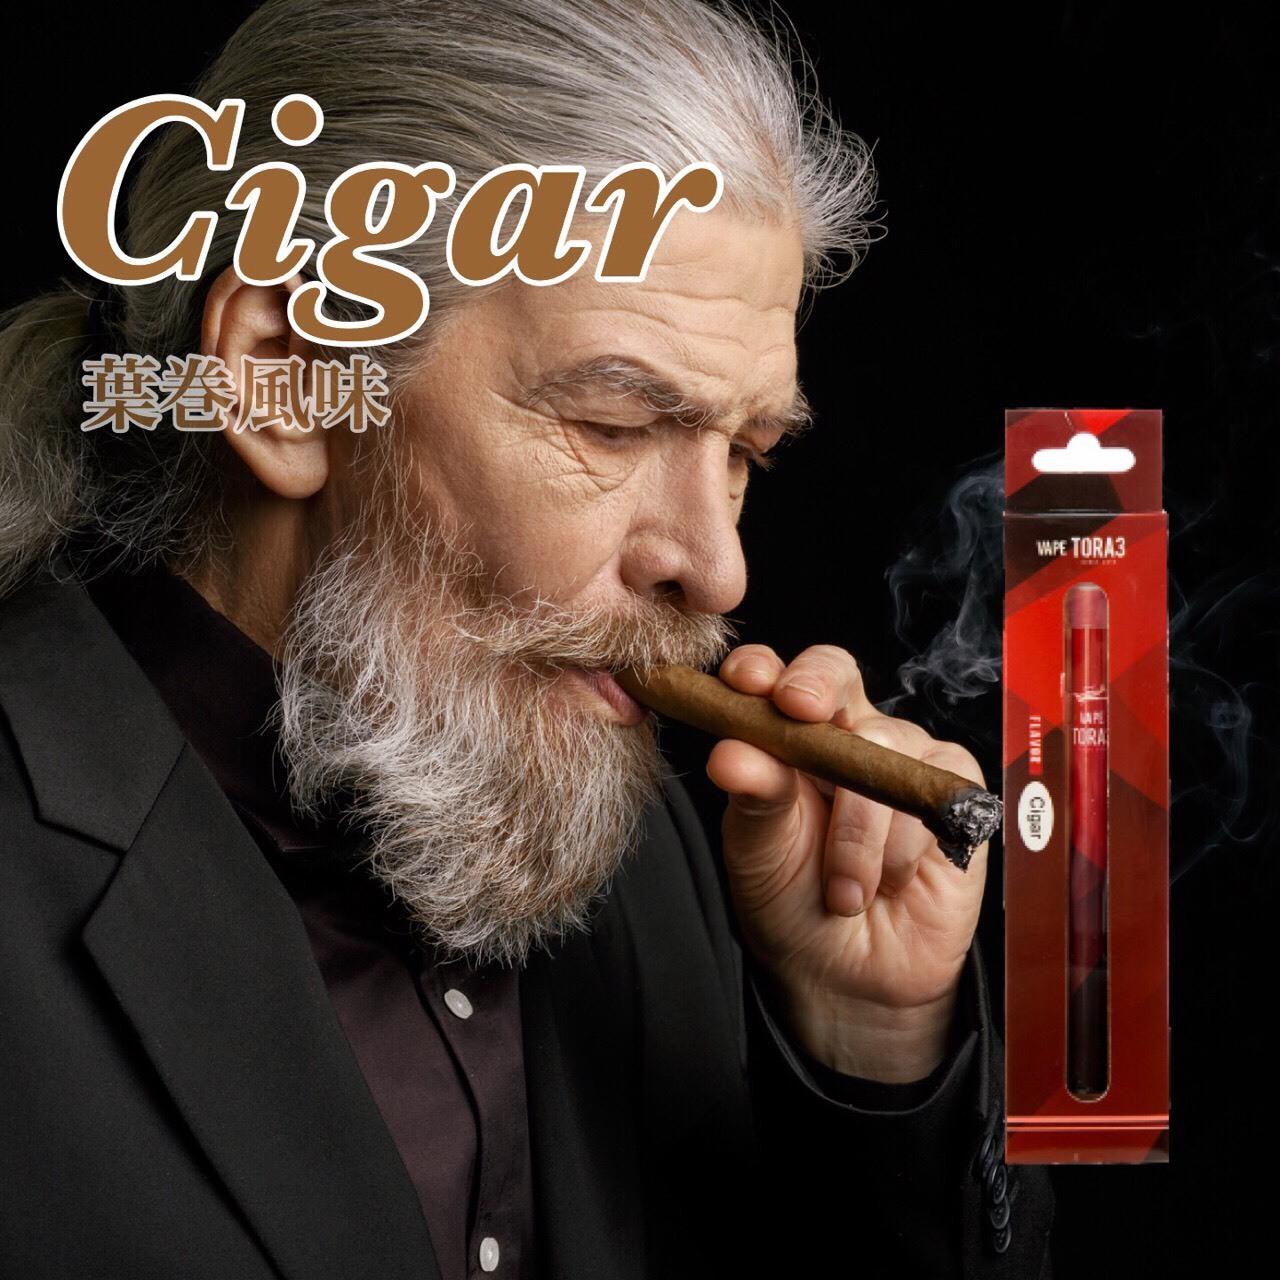 Cigar(キューバ葉巻風味)使い捨て 電子タバコ VAPE TORA3